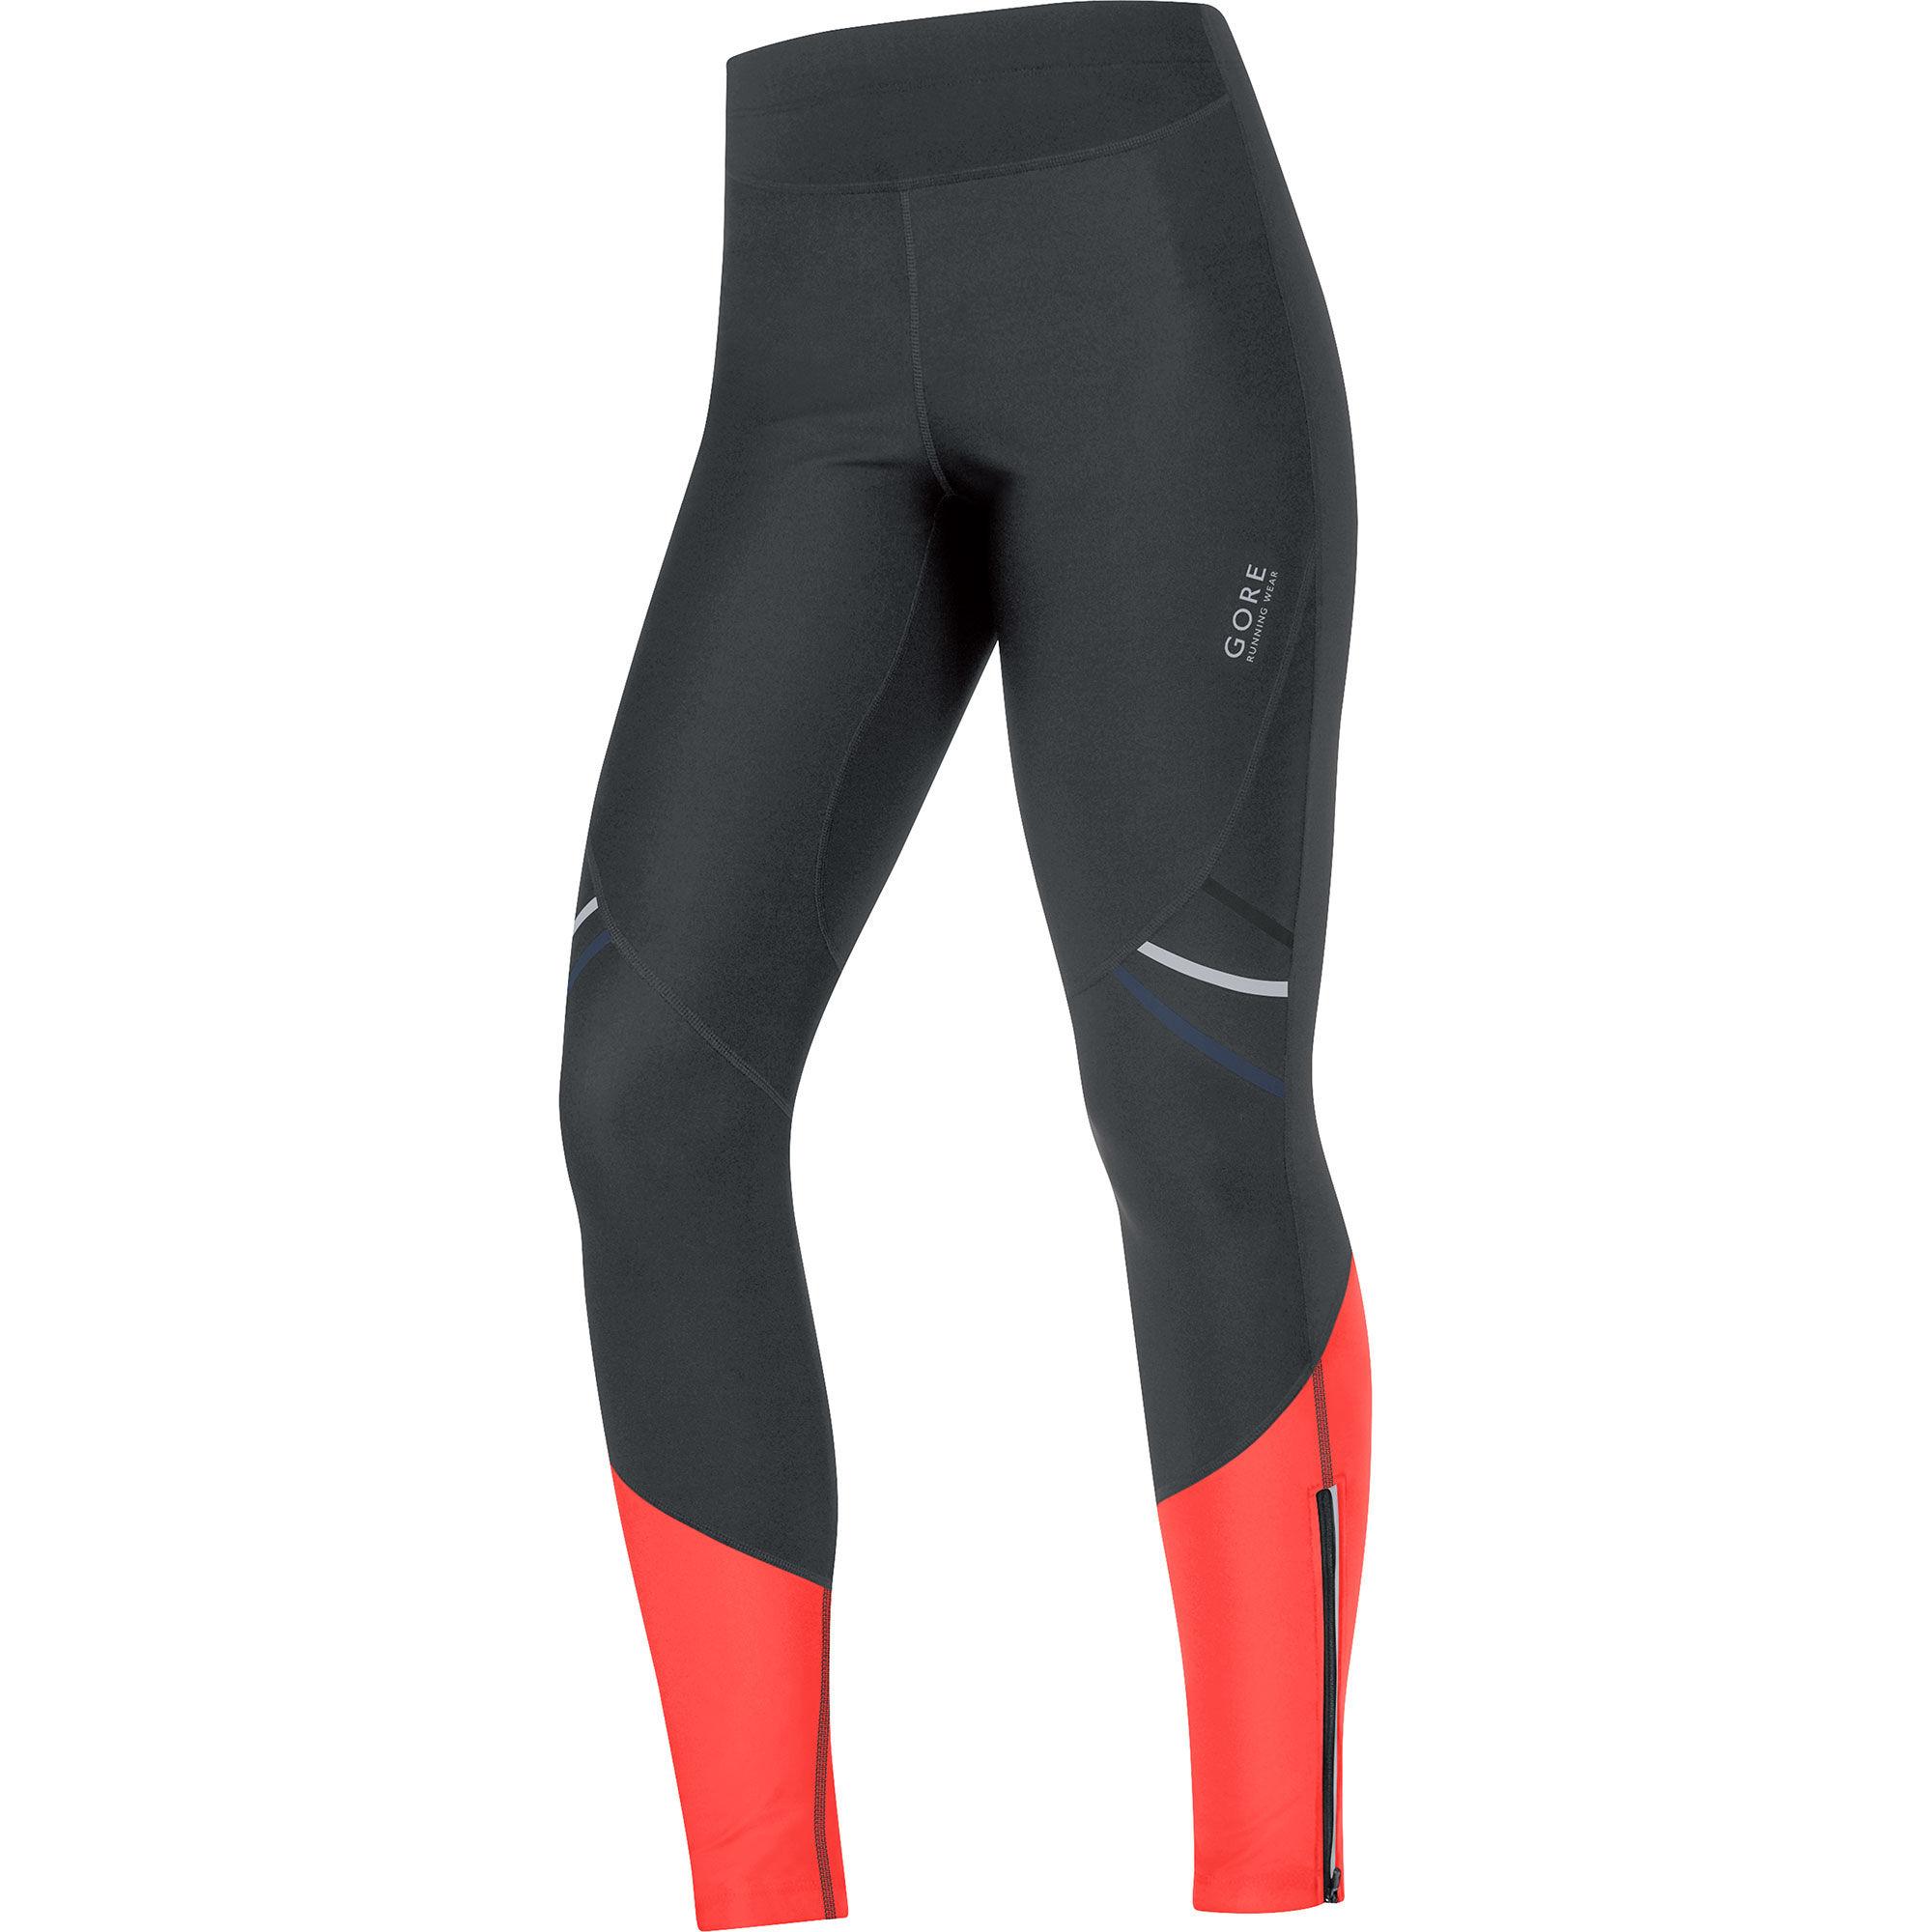 comforter fleet women s w feet c nike balega prem hidden lunarglide comfort products sports socks